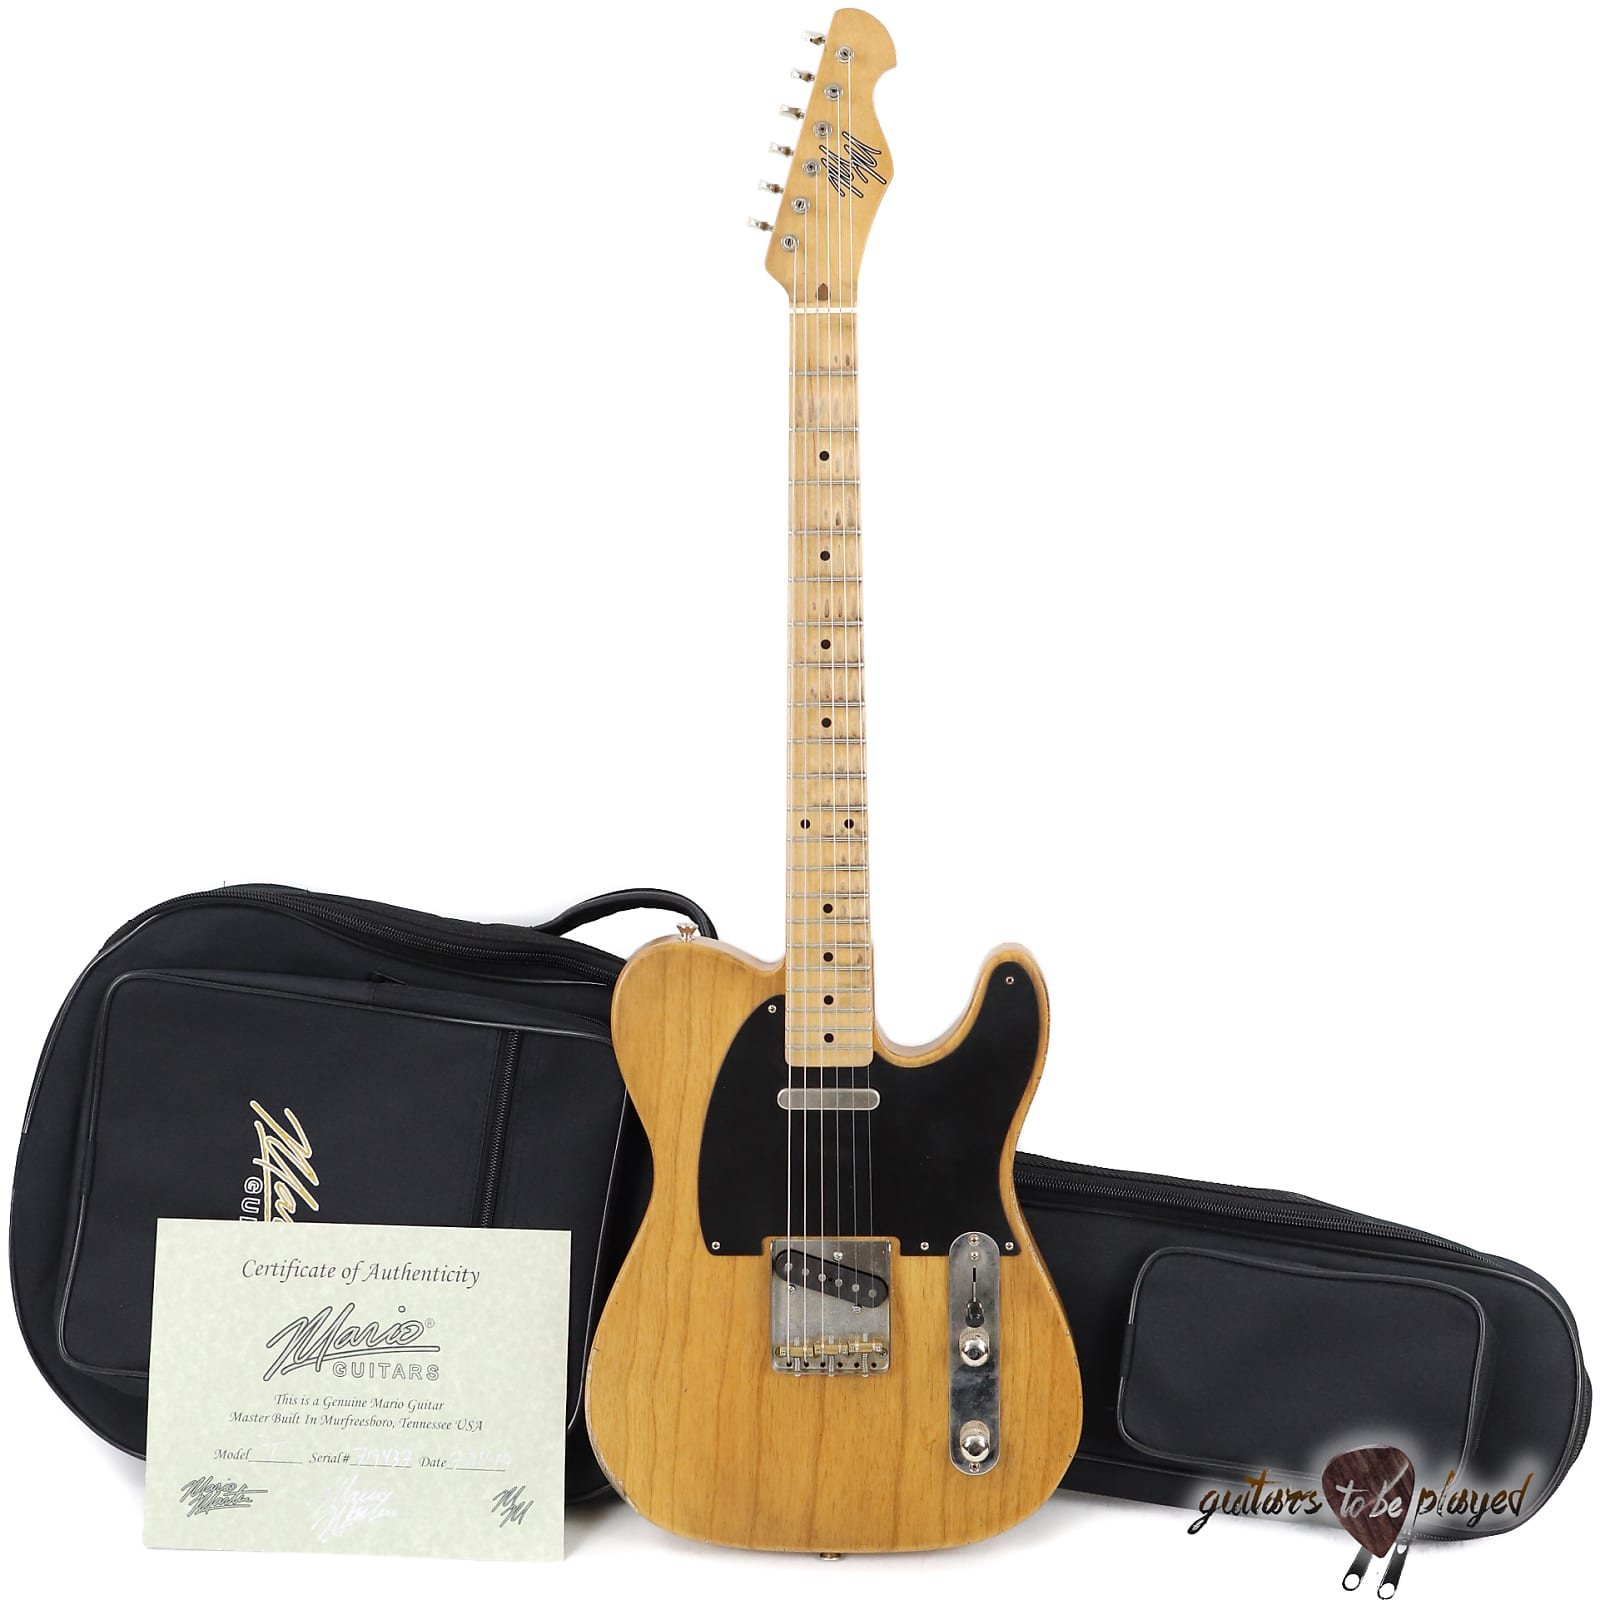 Mario Martin T-Style Guitar w/ 1-pc Swamp Ash Body & Budz 543 Pickups – 5lb 14oz